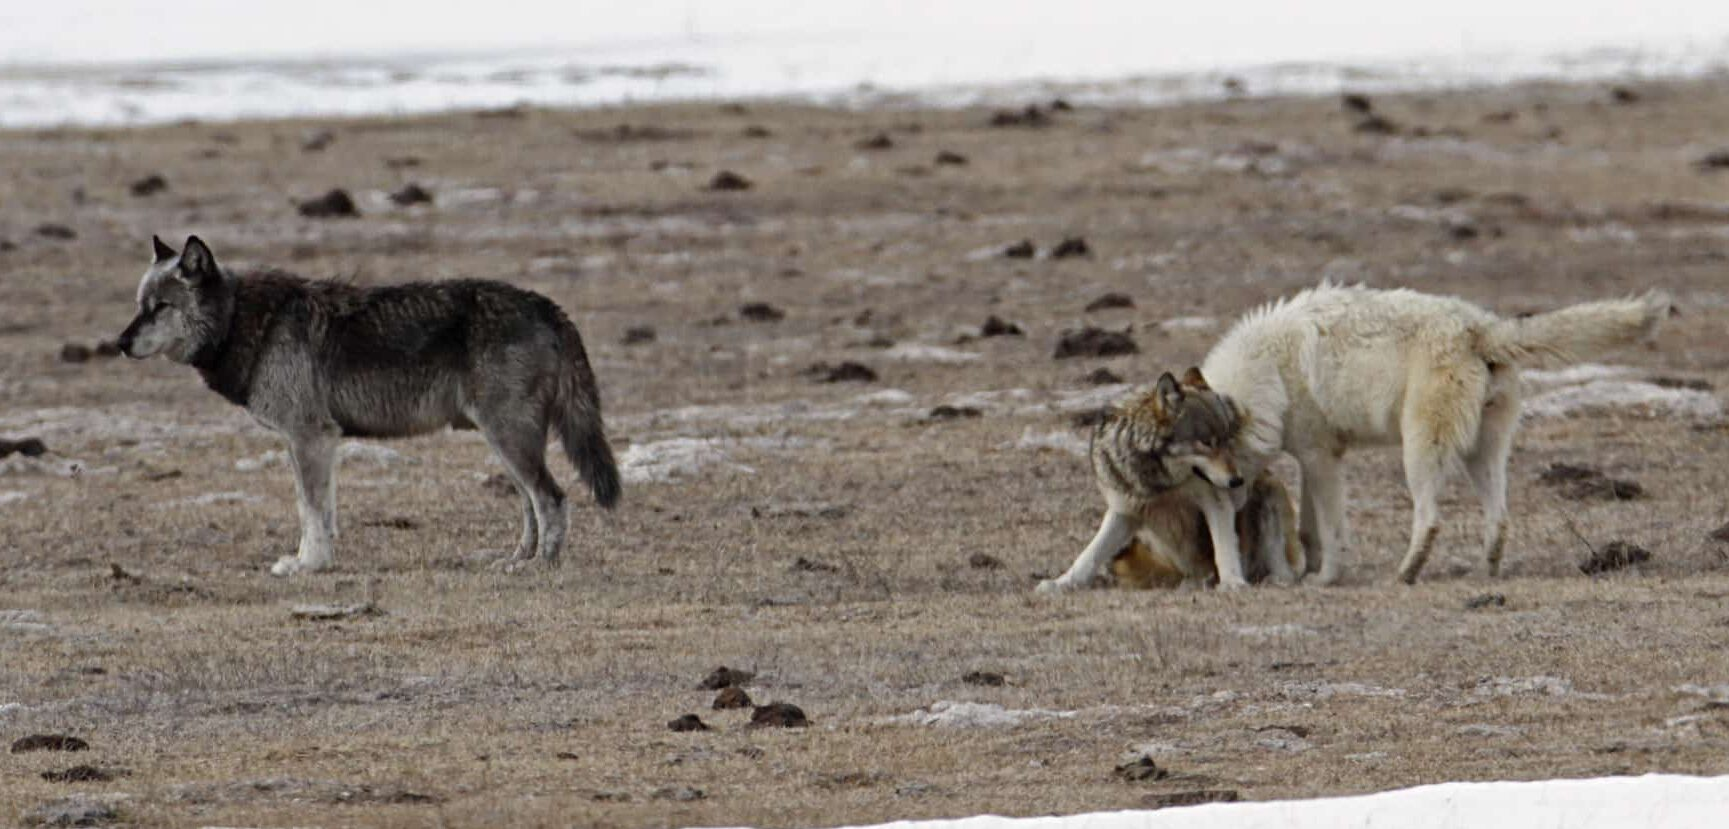 Public Domain: Yellowstone National Park